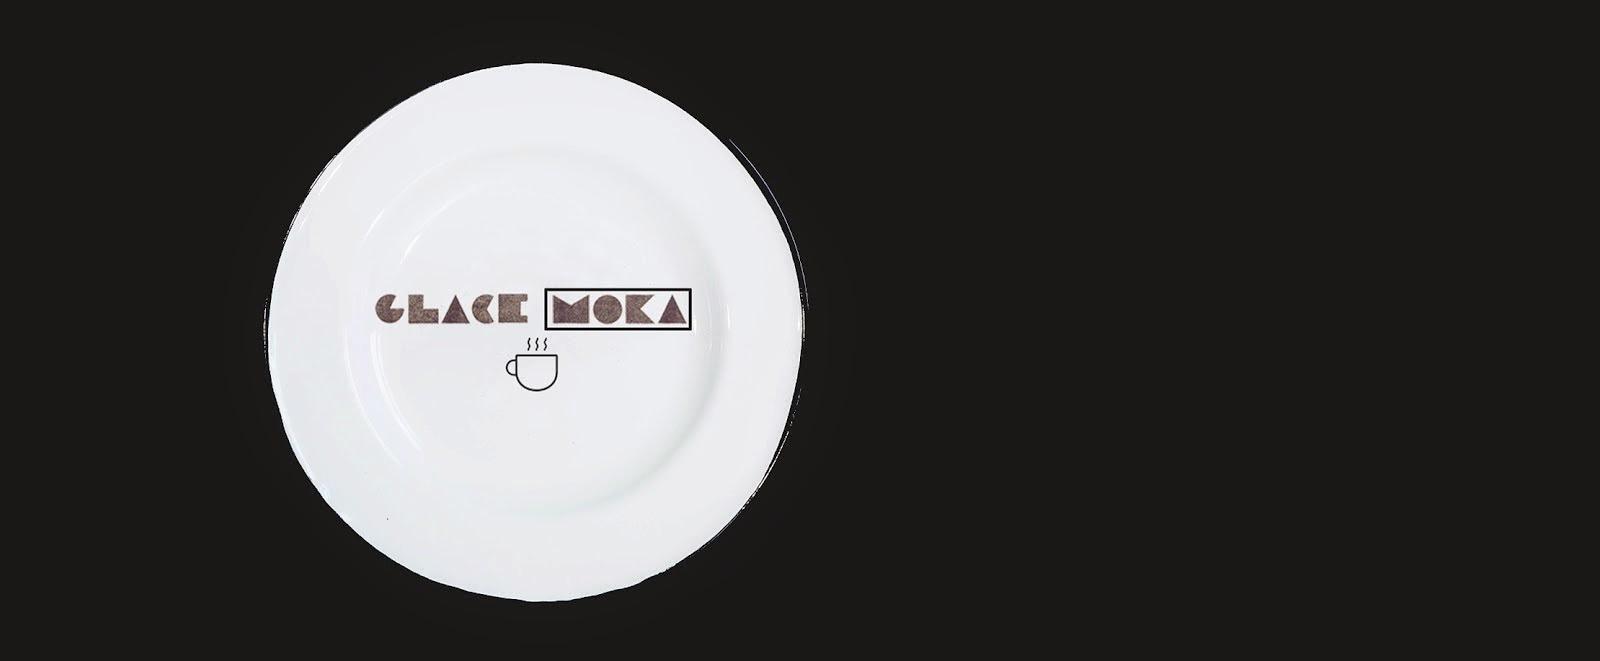 Glace Moka